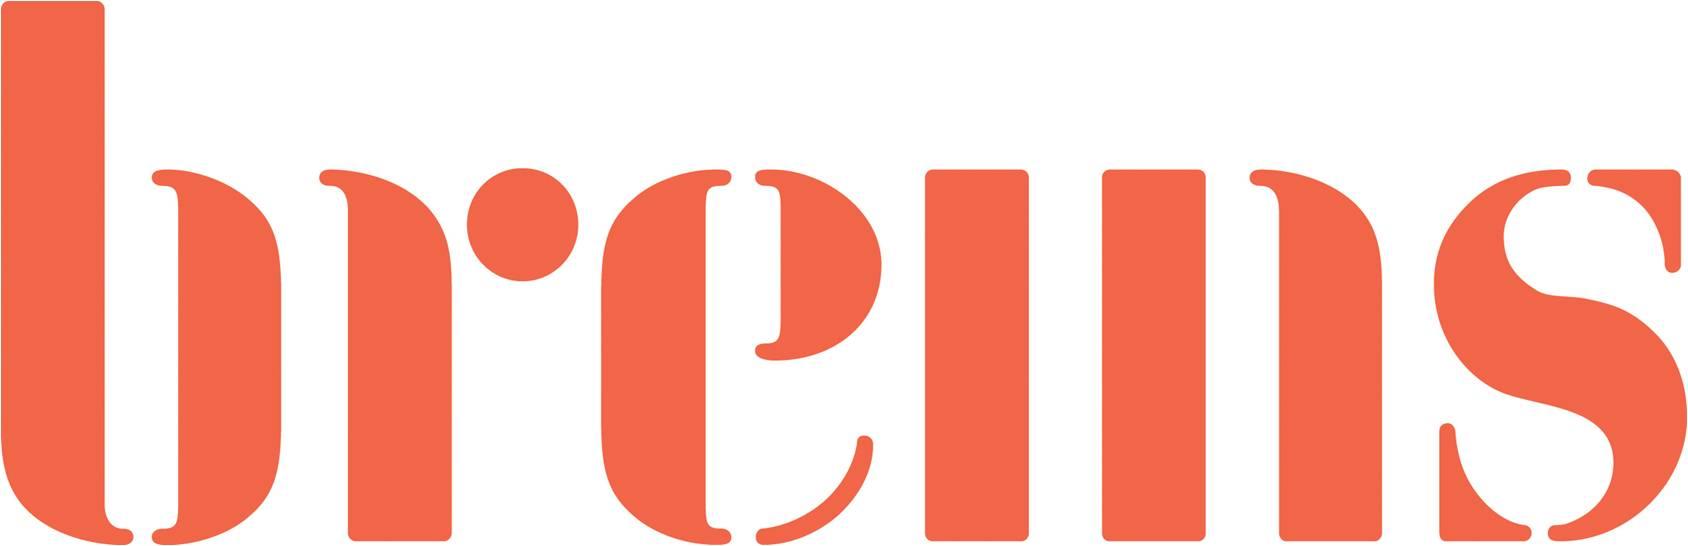 logo brems